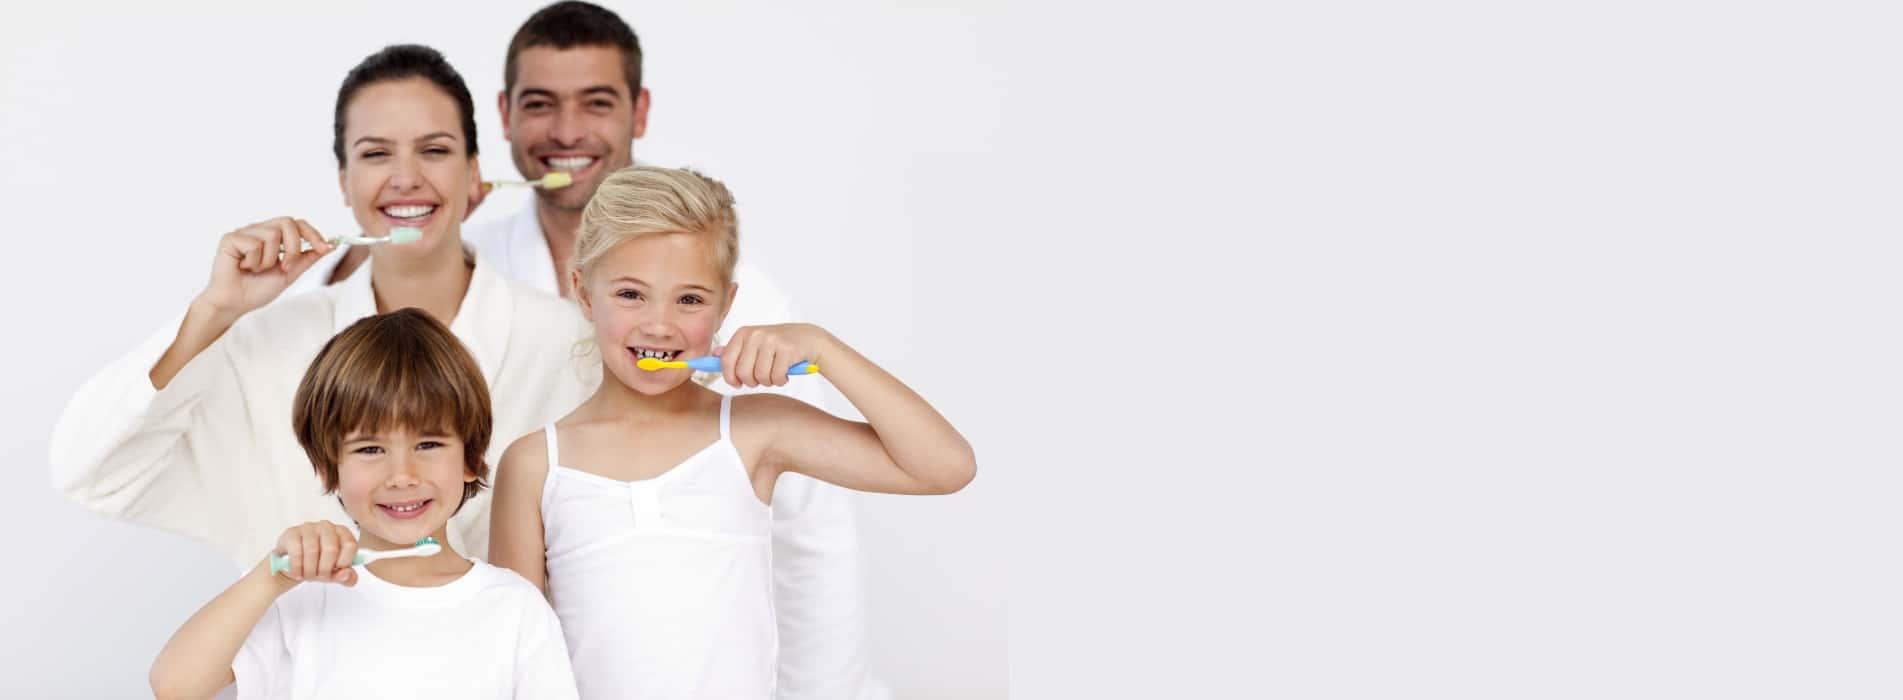 Slide1_ortodonzia_igiene_famiglia_dentista_Pavia_caprioglio-servizi